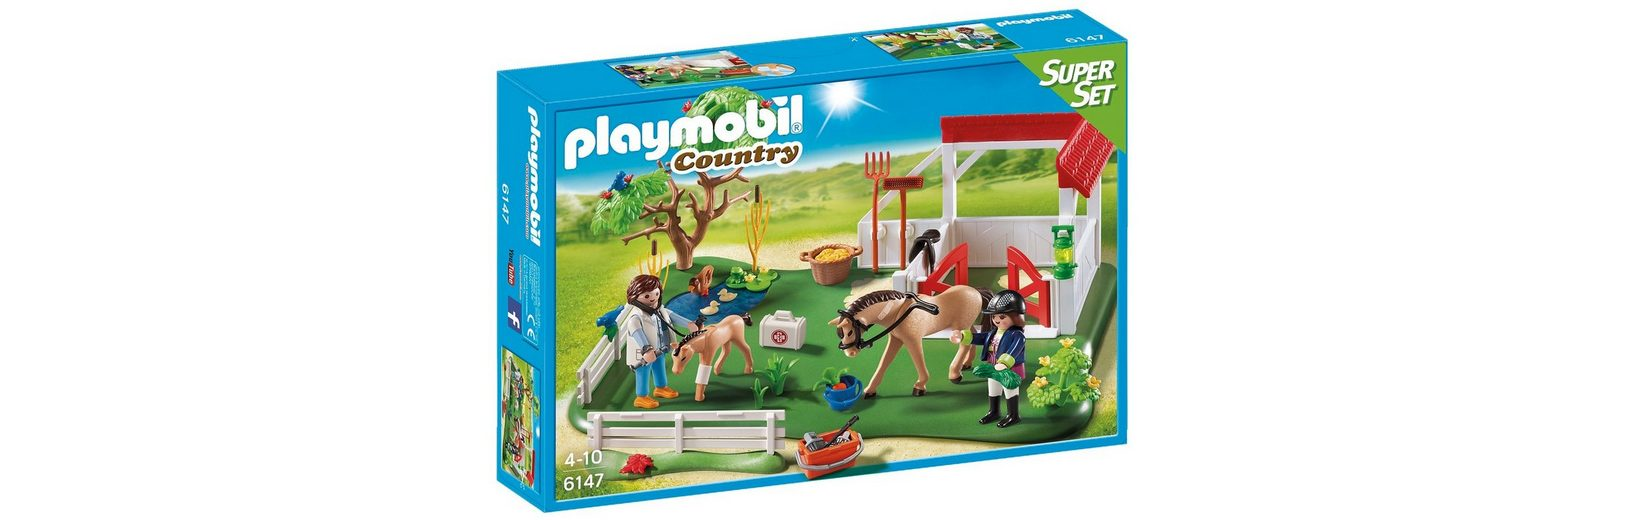 Playmobil® SuperSet Koppel mit Pferdebox (6147), Country